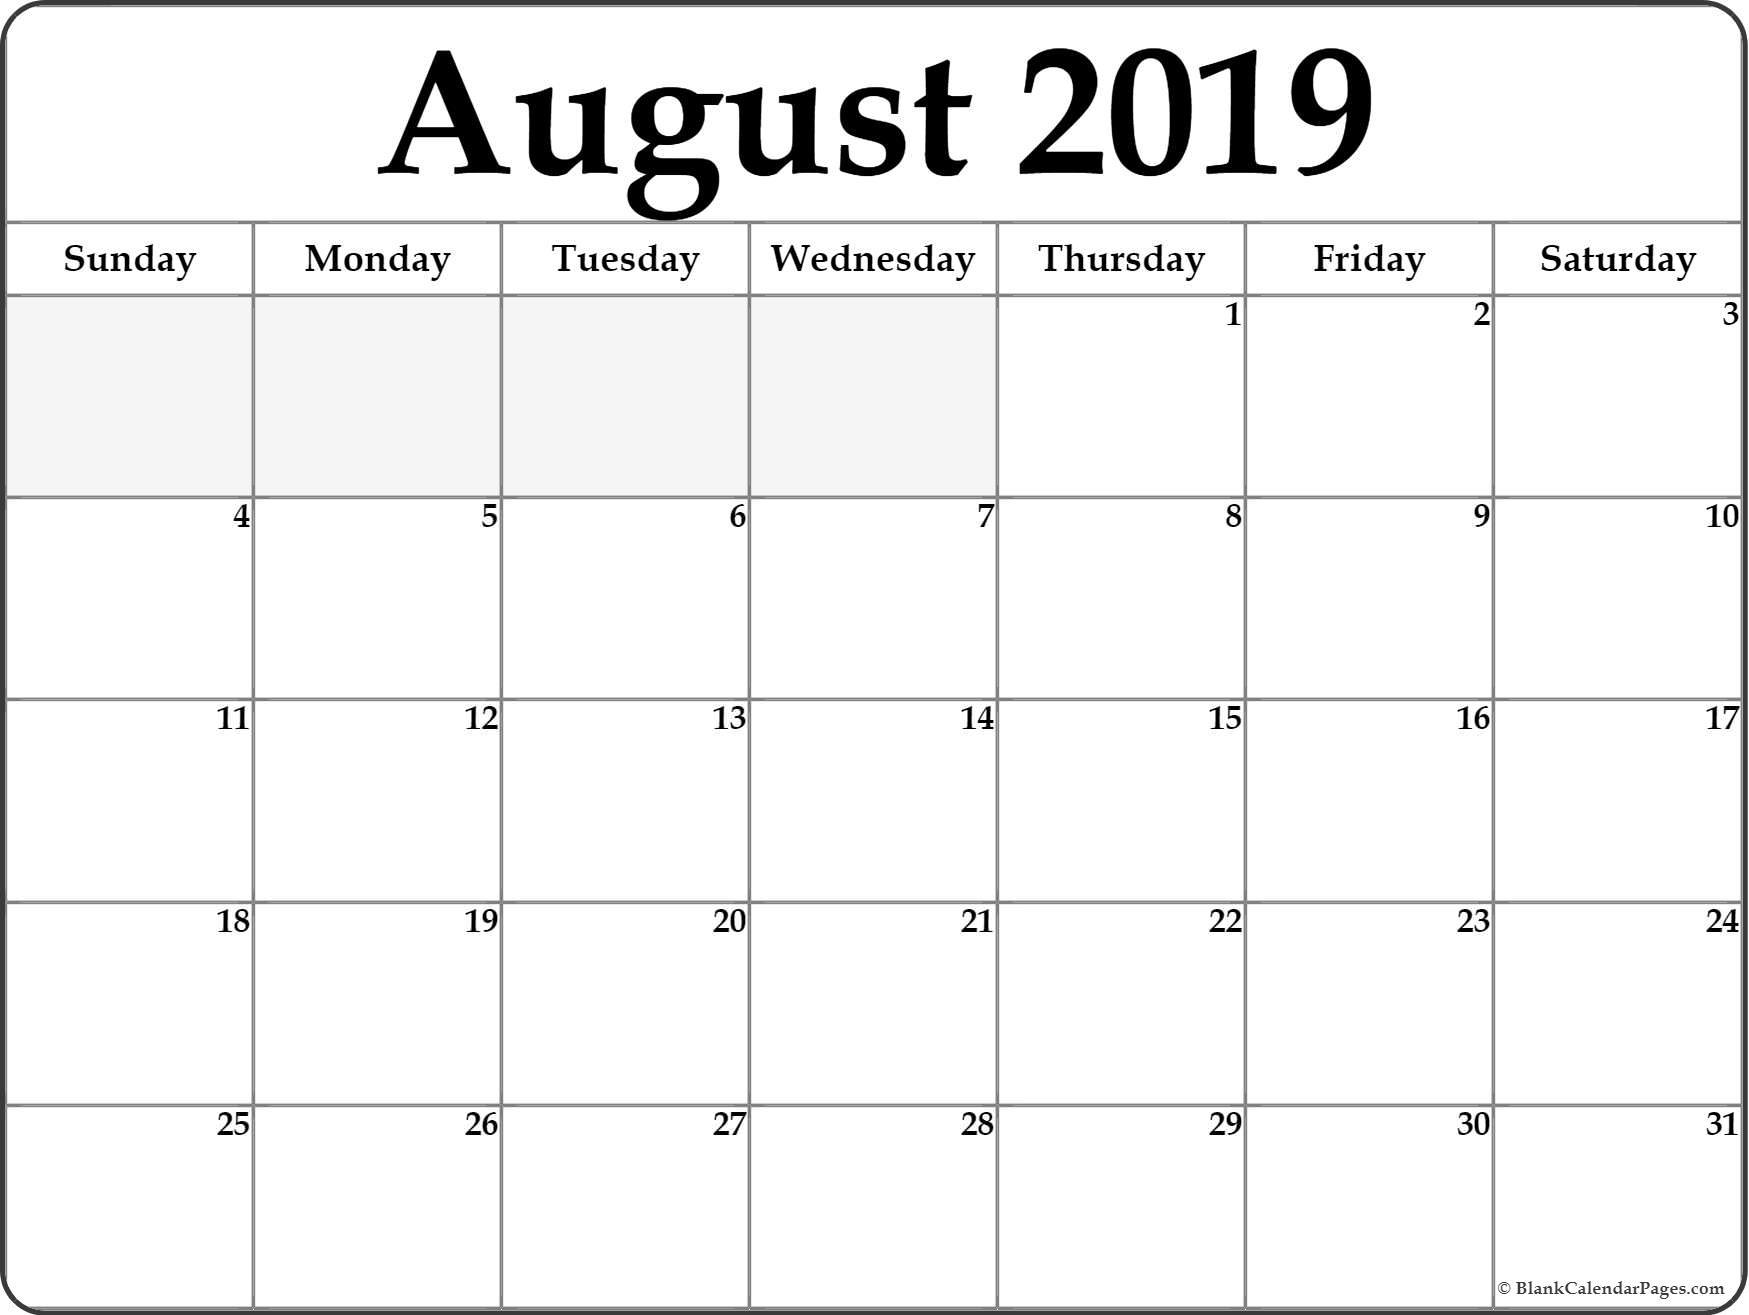 August 2019 Calendar | Free Printable Monthly Calendars intended for Blank Calendar Printable August